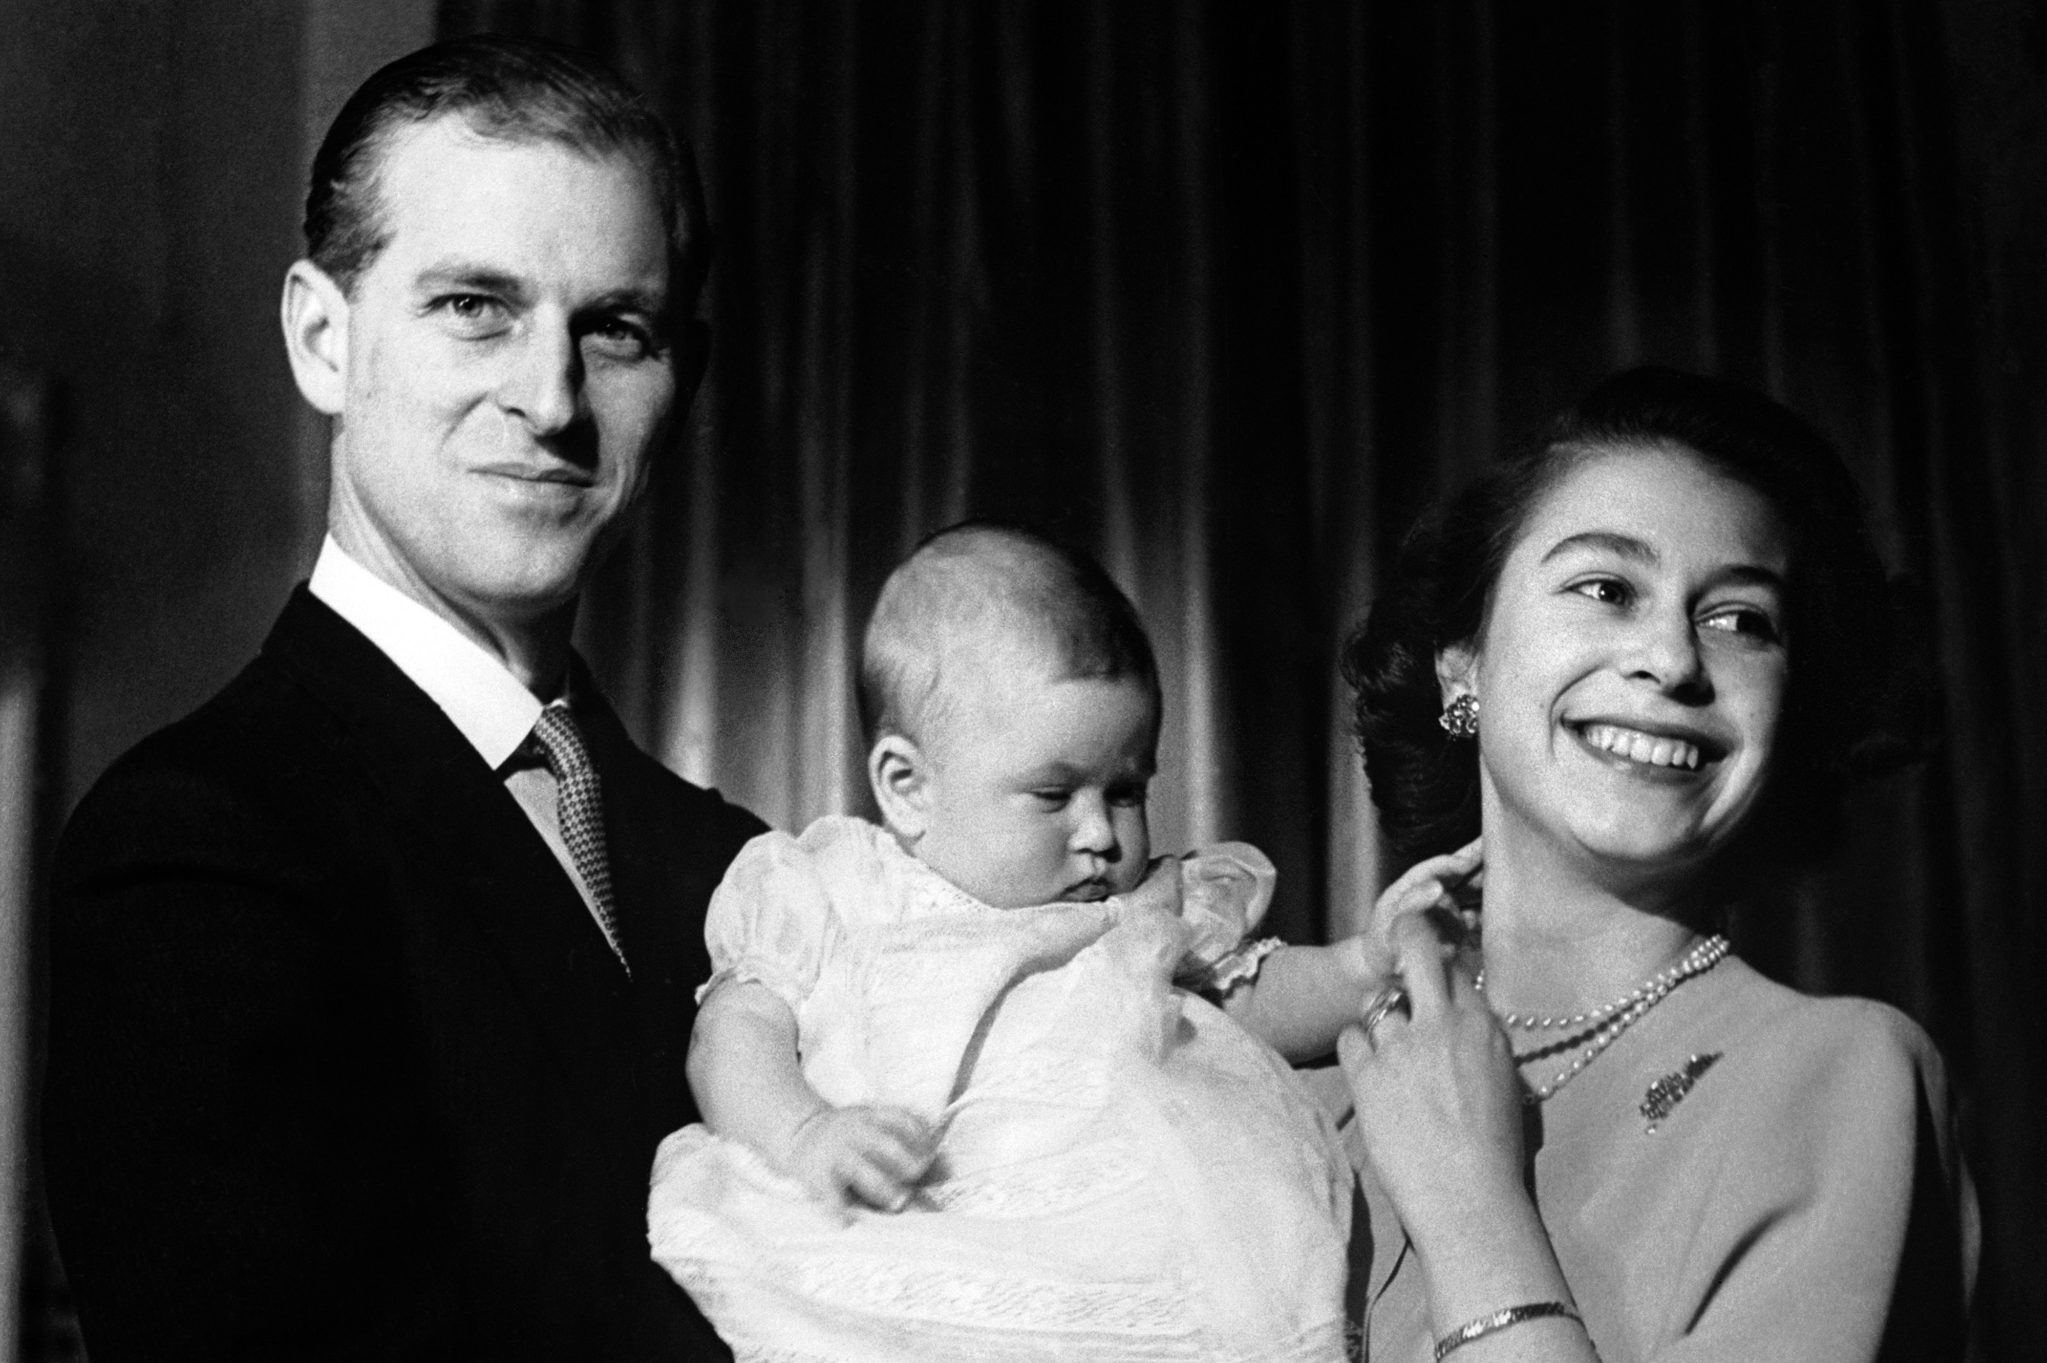 Royalty - Princess Elizabeth and Duke of Edinburgh with Prince Charles - Buckingham Palace, London